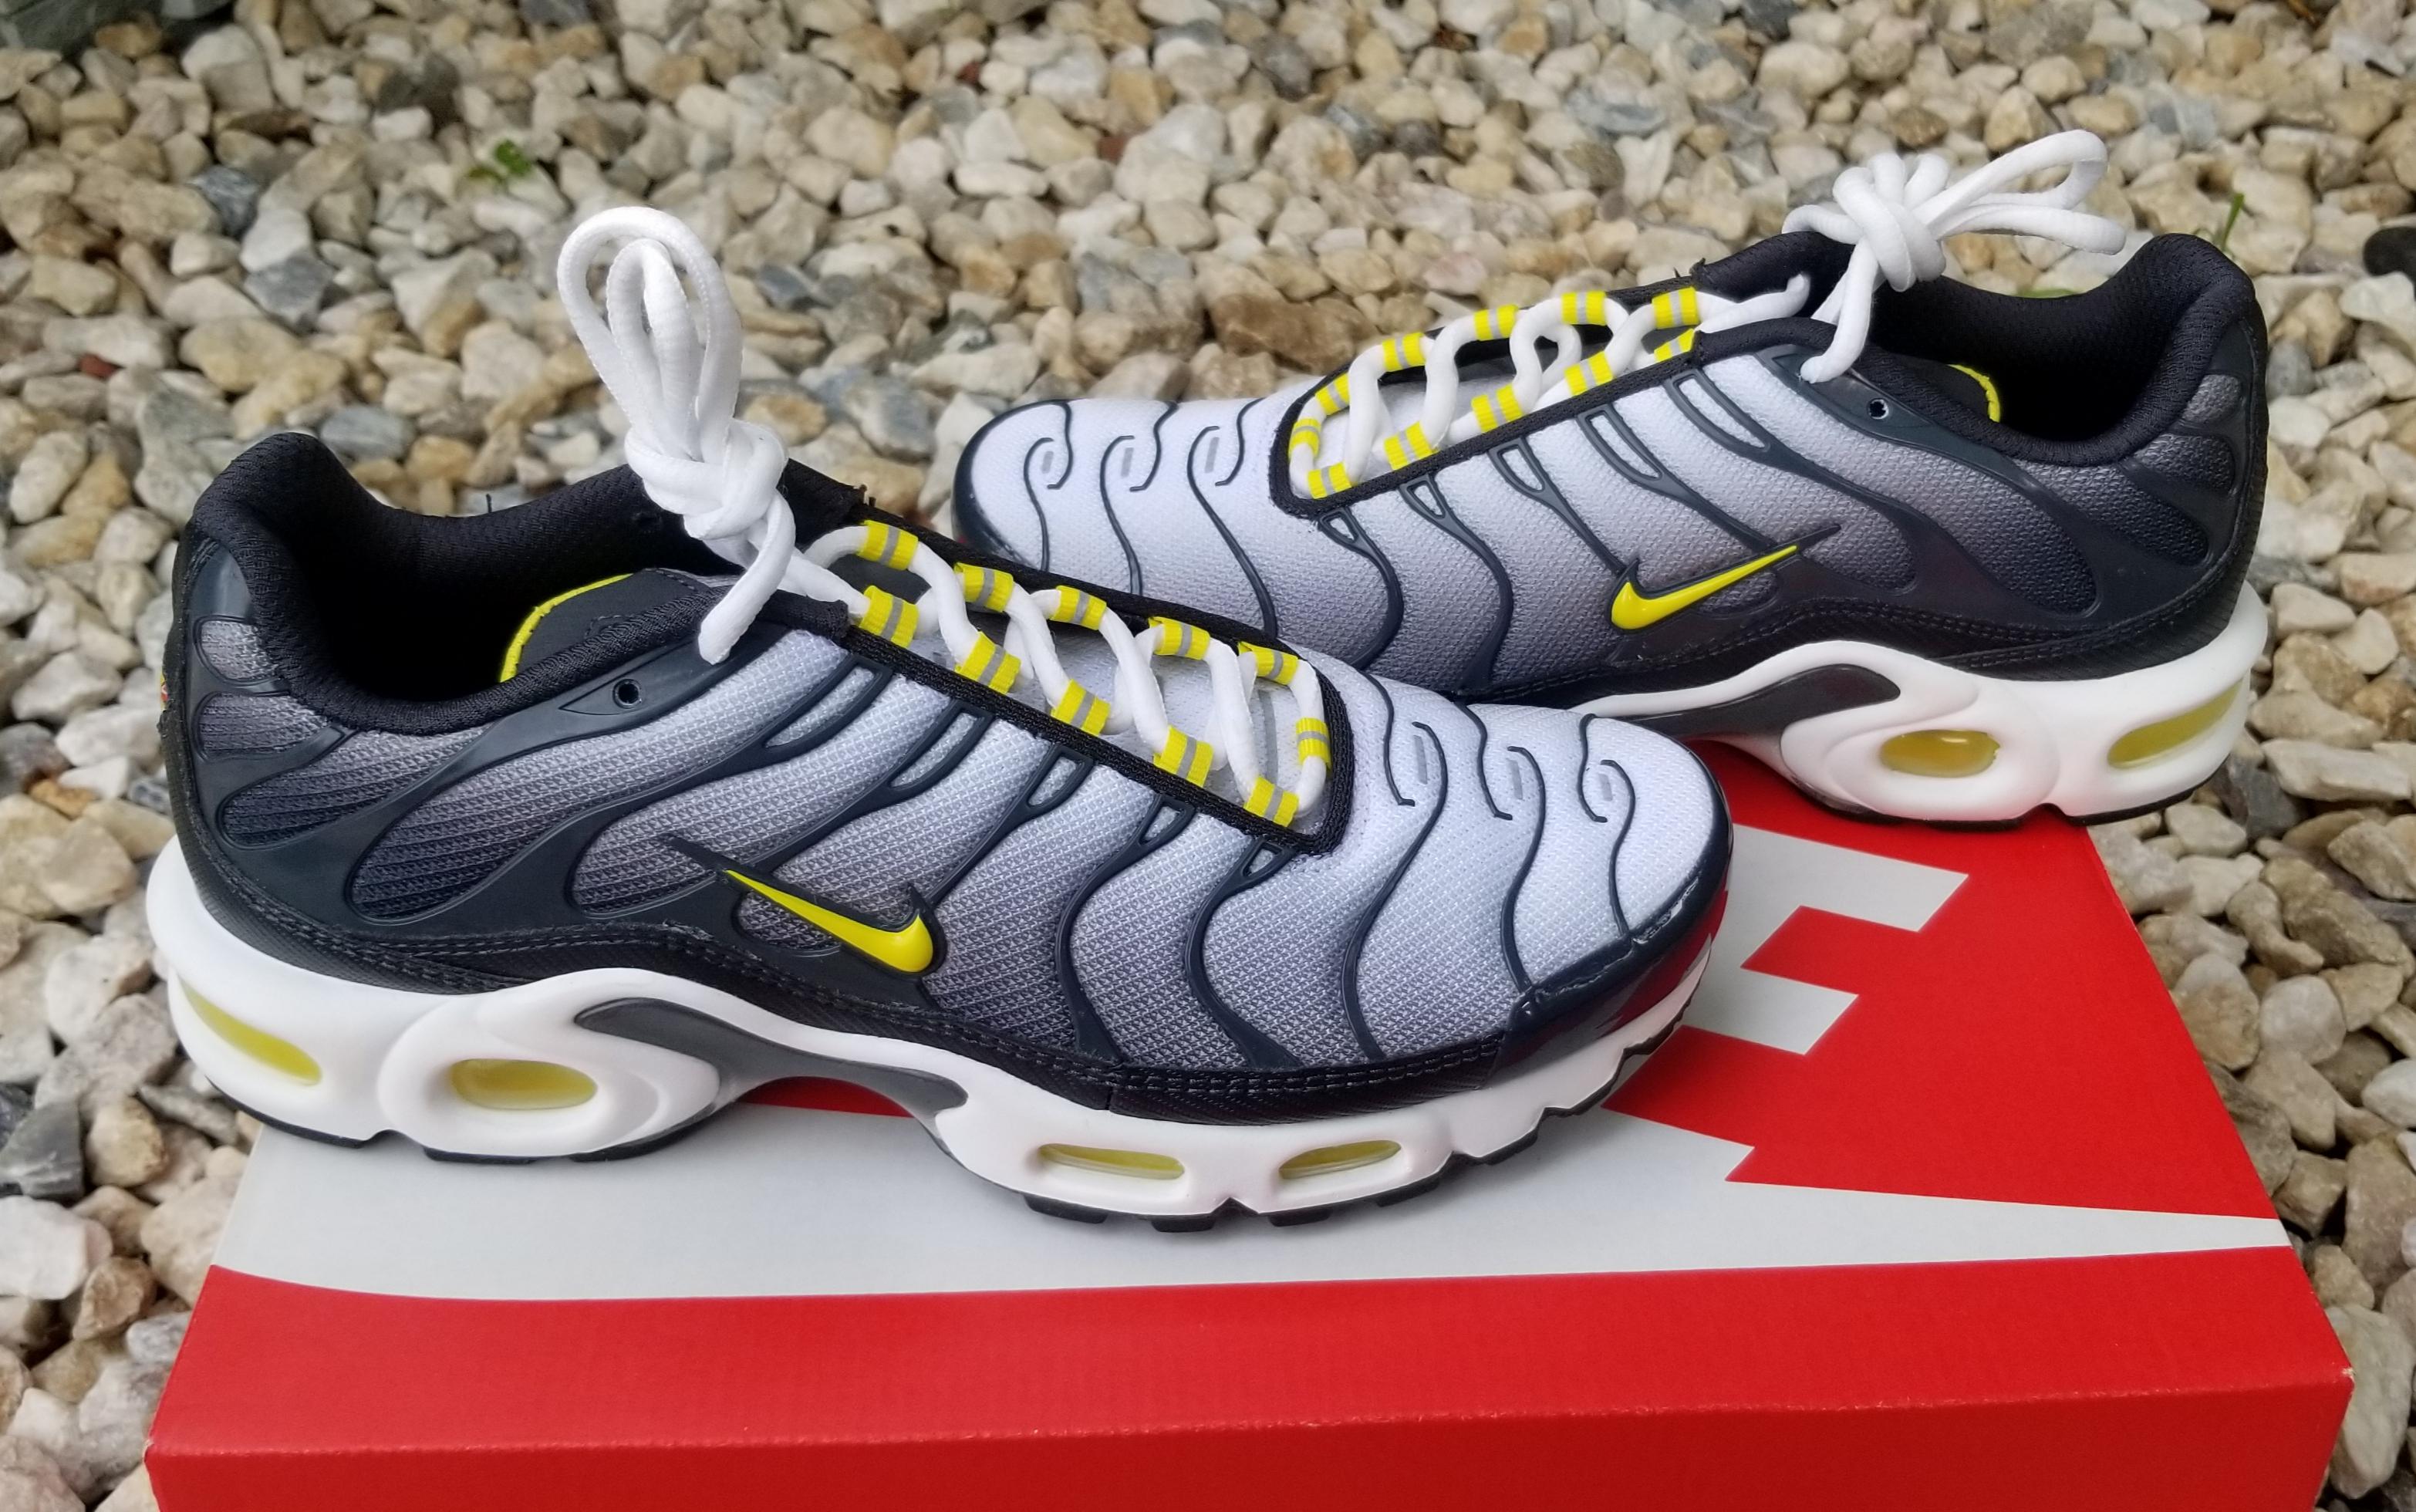 Nike Air Max Plus TN Tuned Bumble Bee Yellow Black Silver